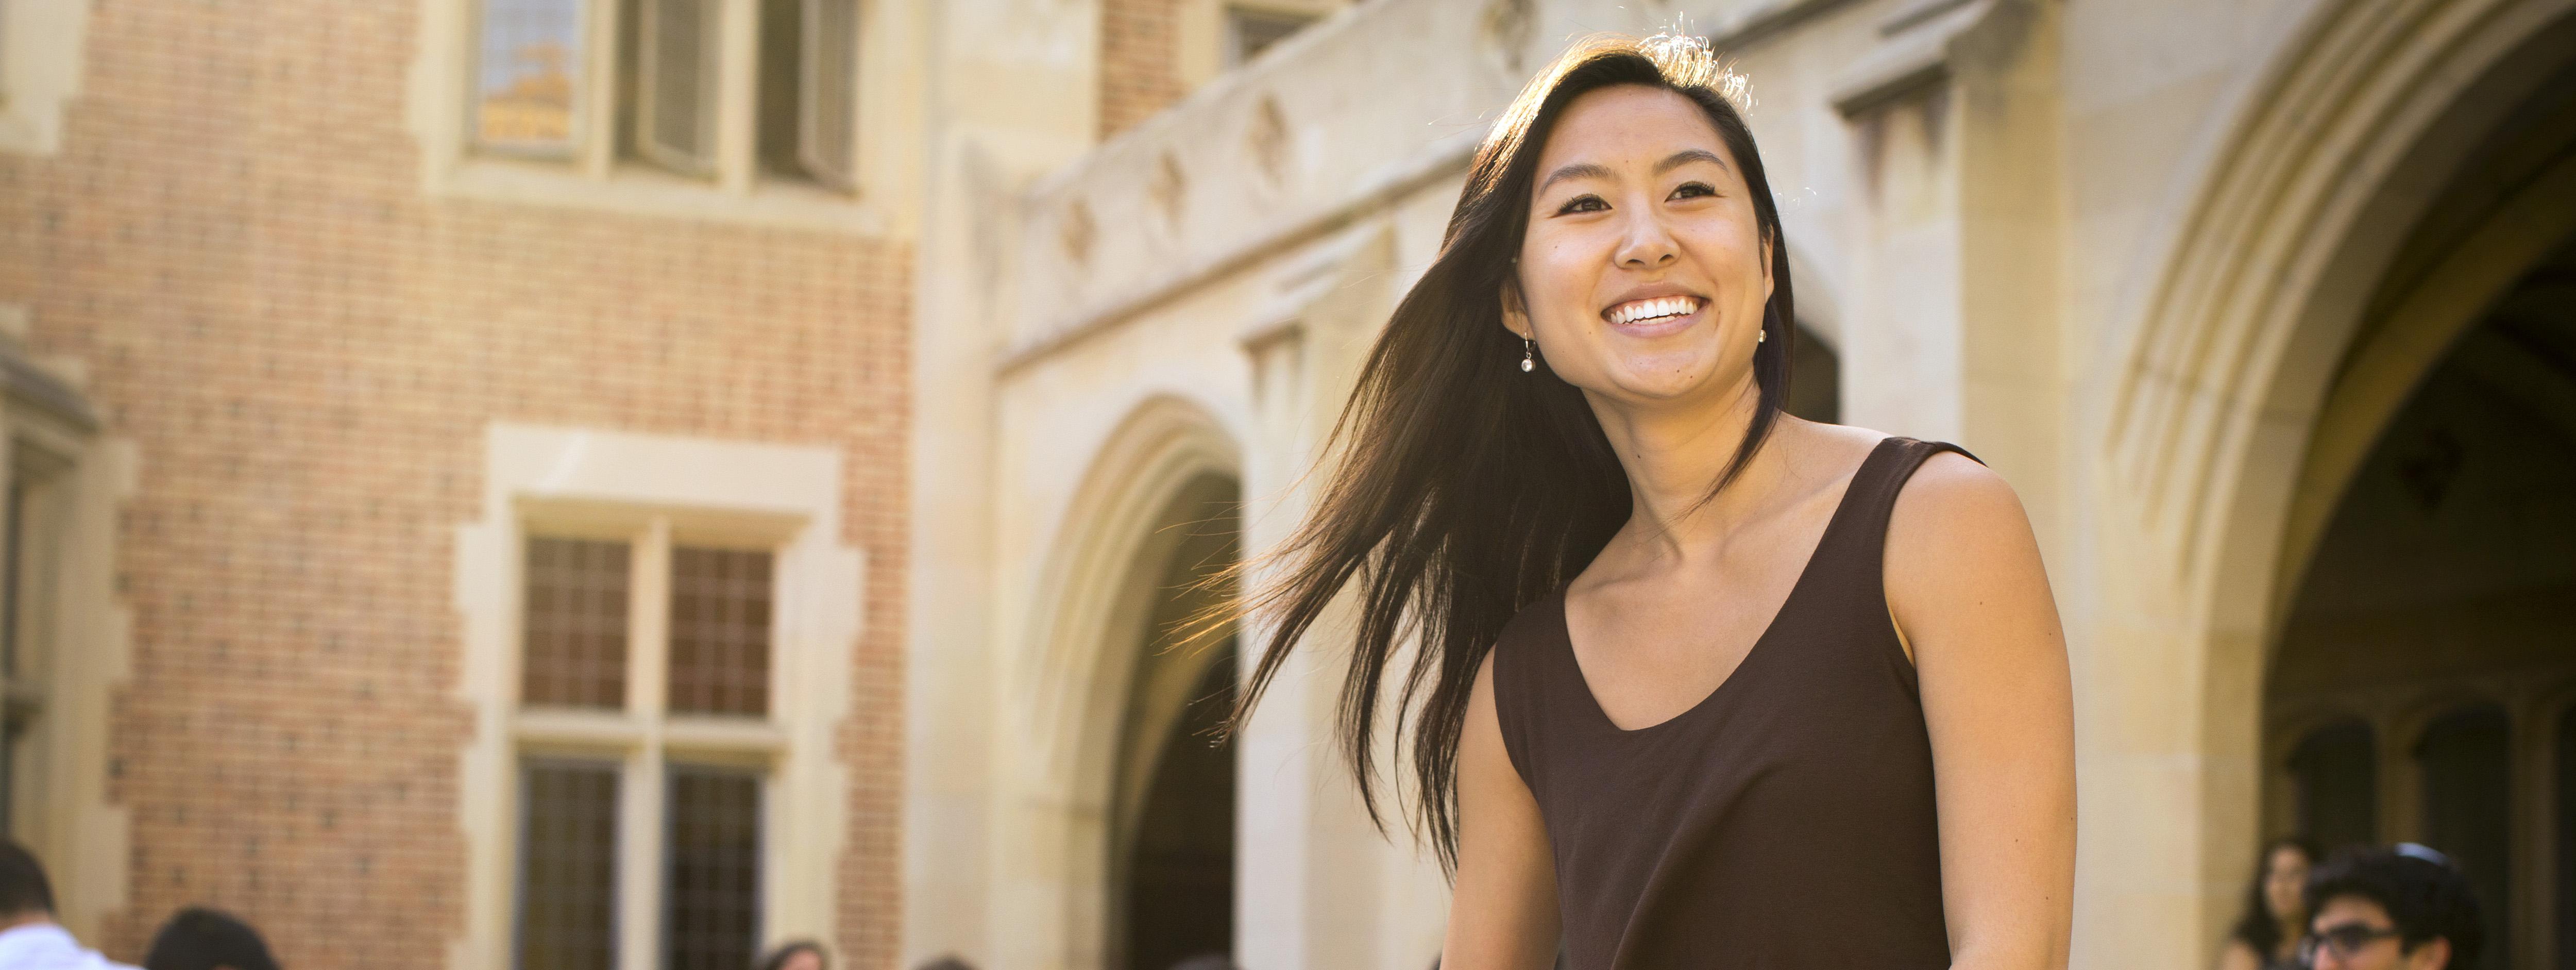 UCLA student